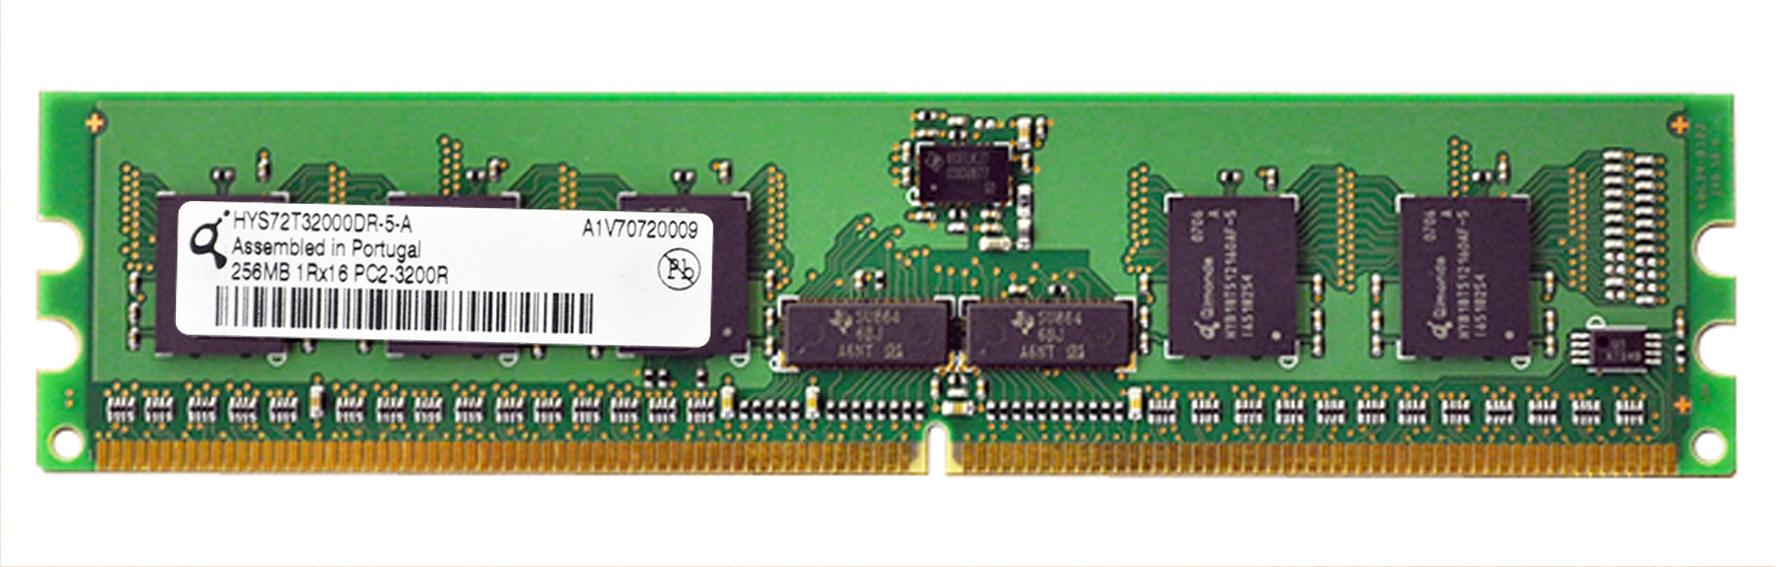 M4L Certified 256MB 400MHz DDR2 PC2-3200 Reg ECC CL3 240-Pin Single Rank x16 DIMM Mfr P/N M4L-PC2400RD2S16256M